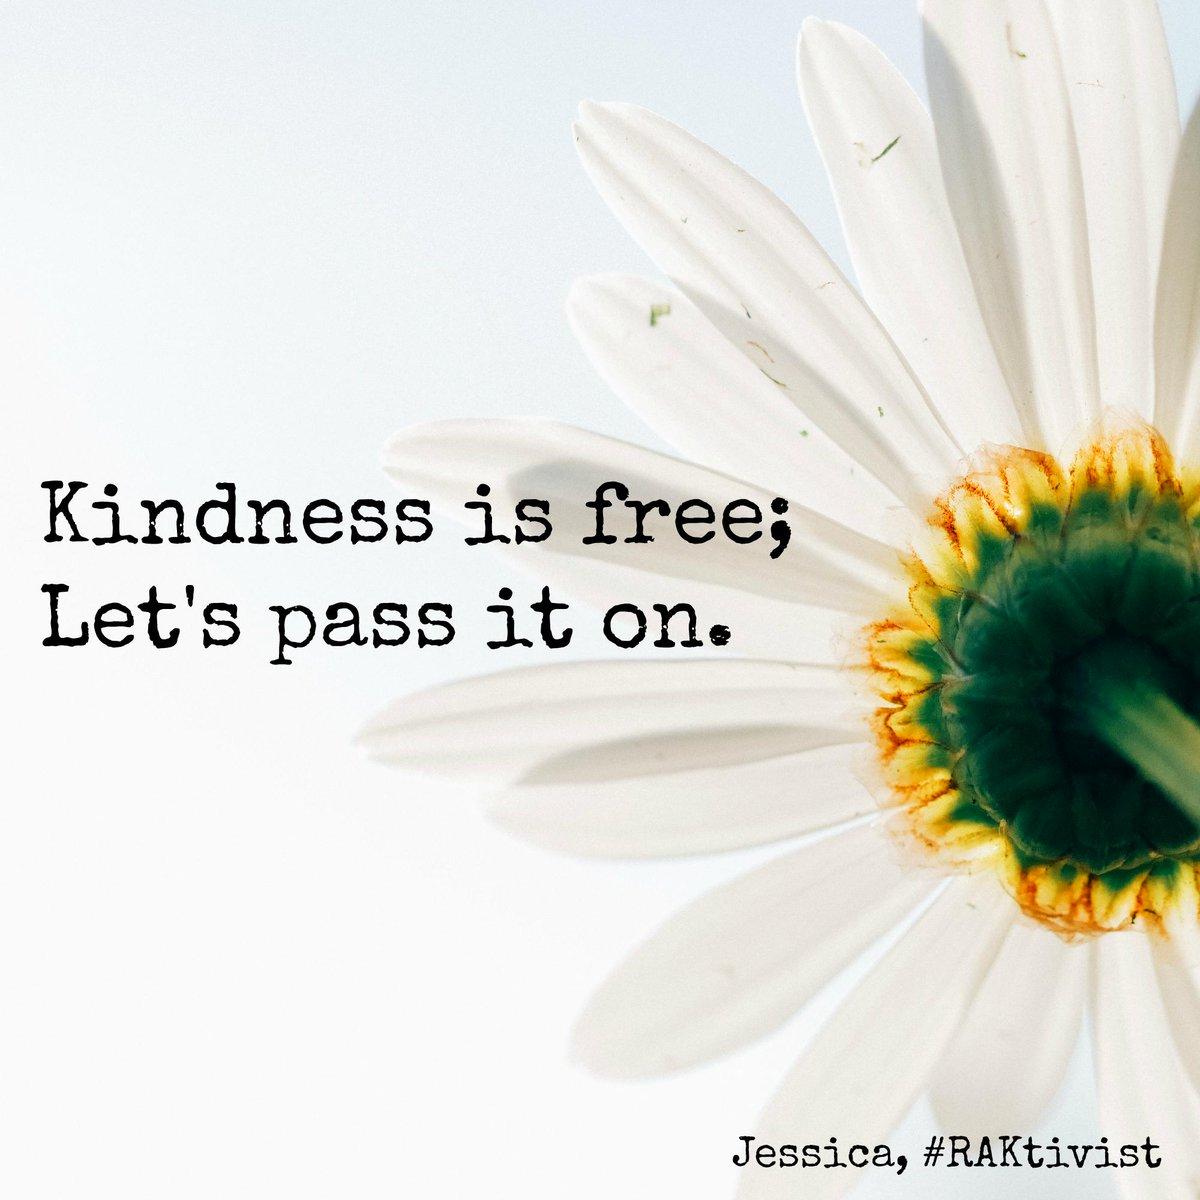 Randomactsofkindness On Twitter Kindness Is Free Let S Pass It On Raktivist Http T Co Nzymz8ivai